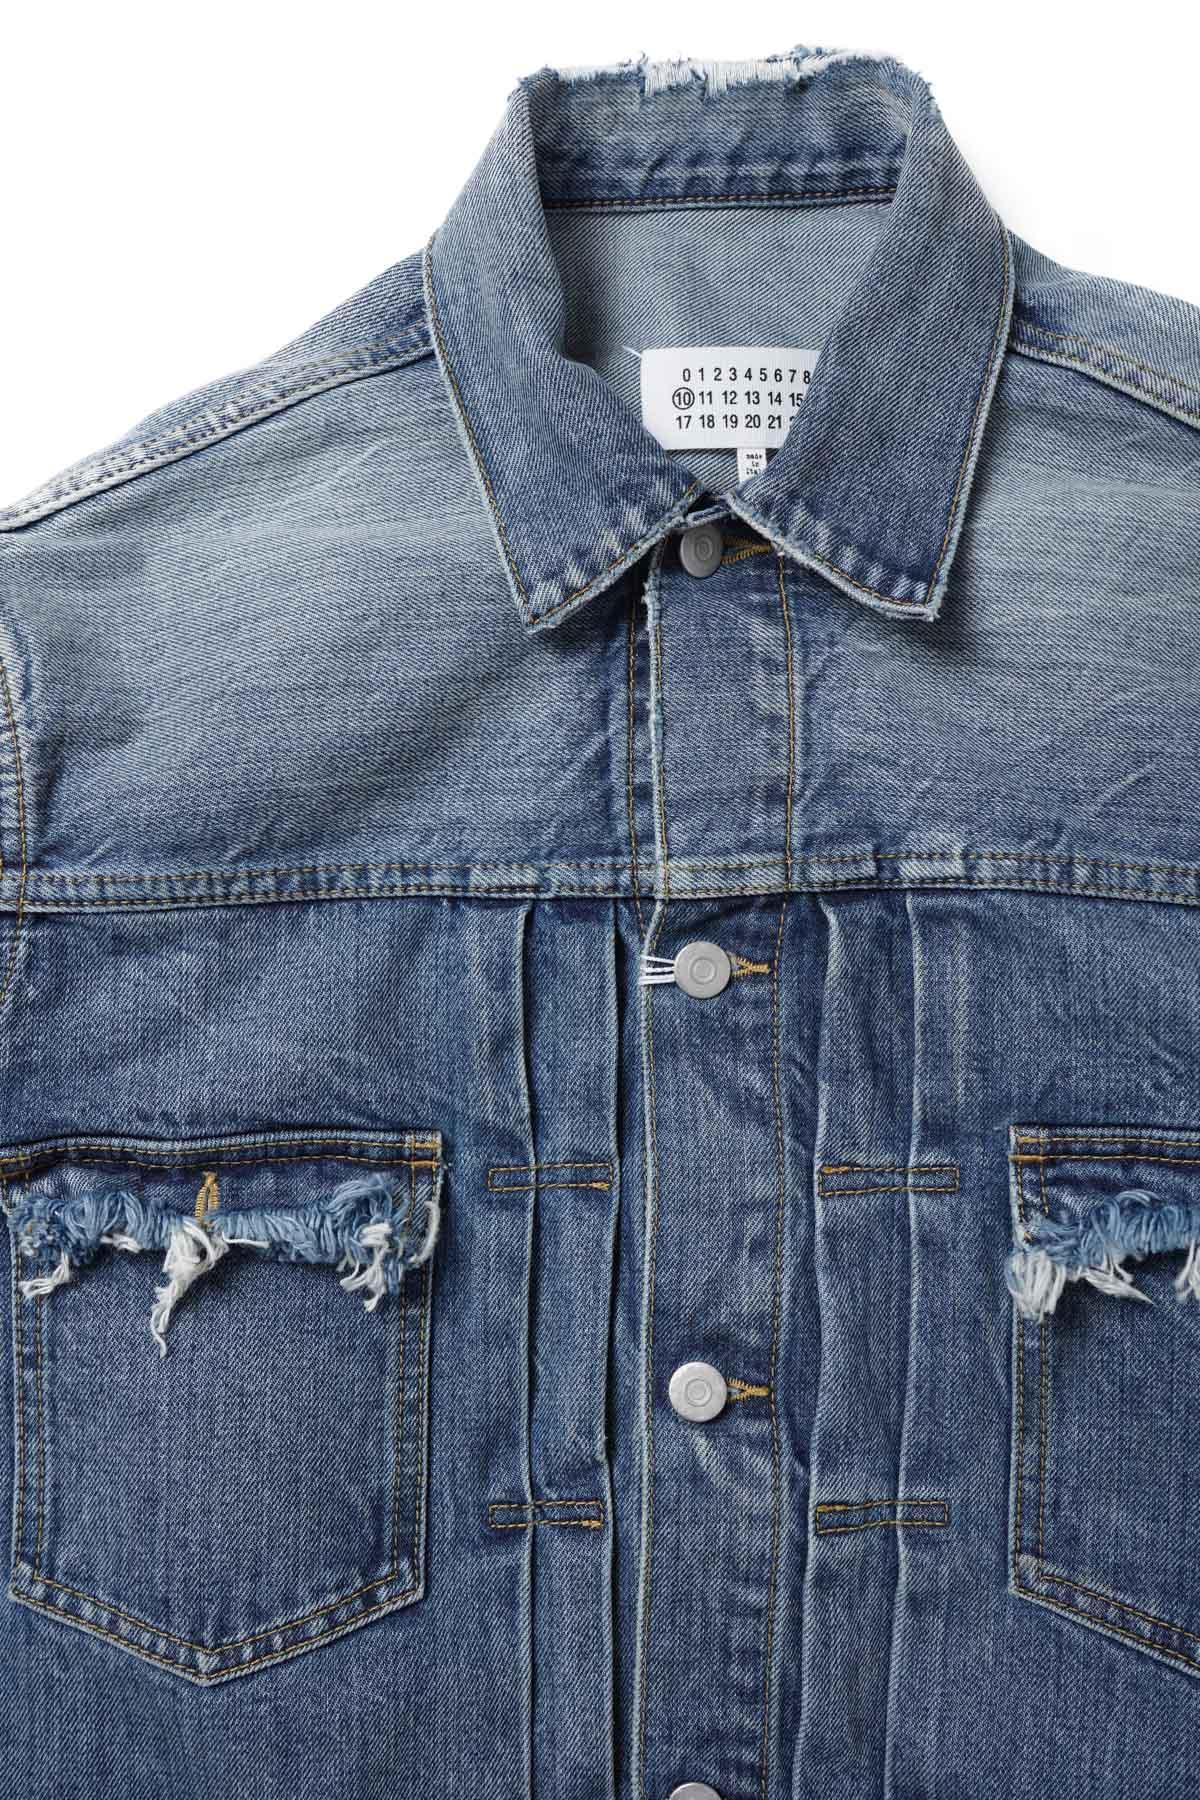 Denim Jacket [2021SS]